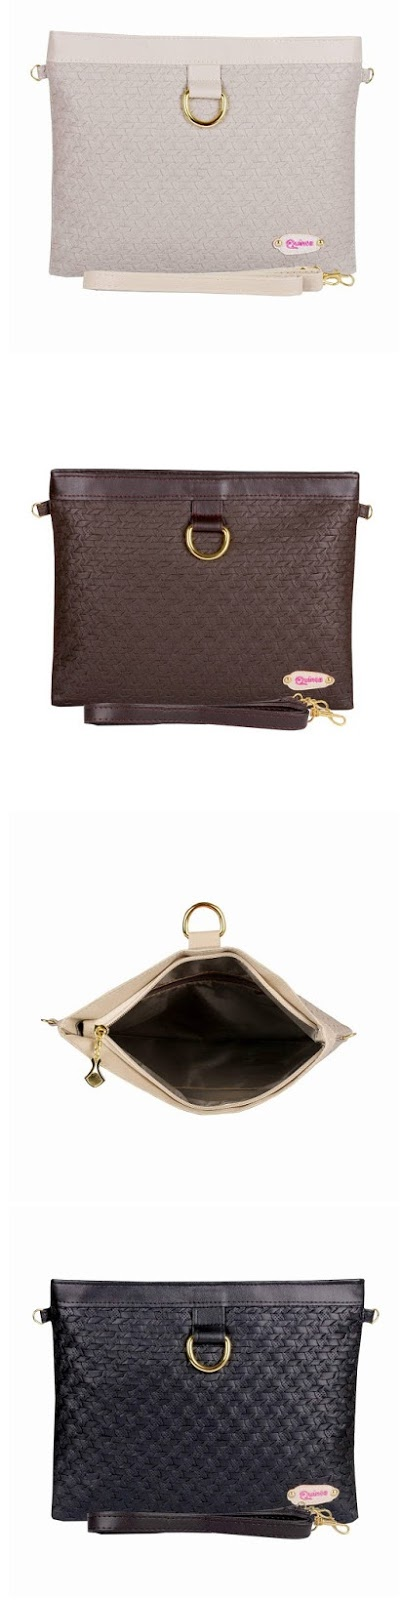 tas sling bag wanita kekinian, jual tas sling bag wanita murah, tas sling bag wanita branded